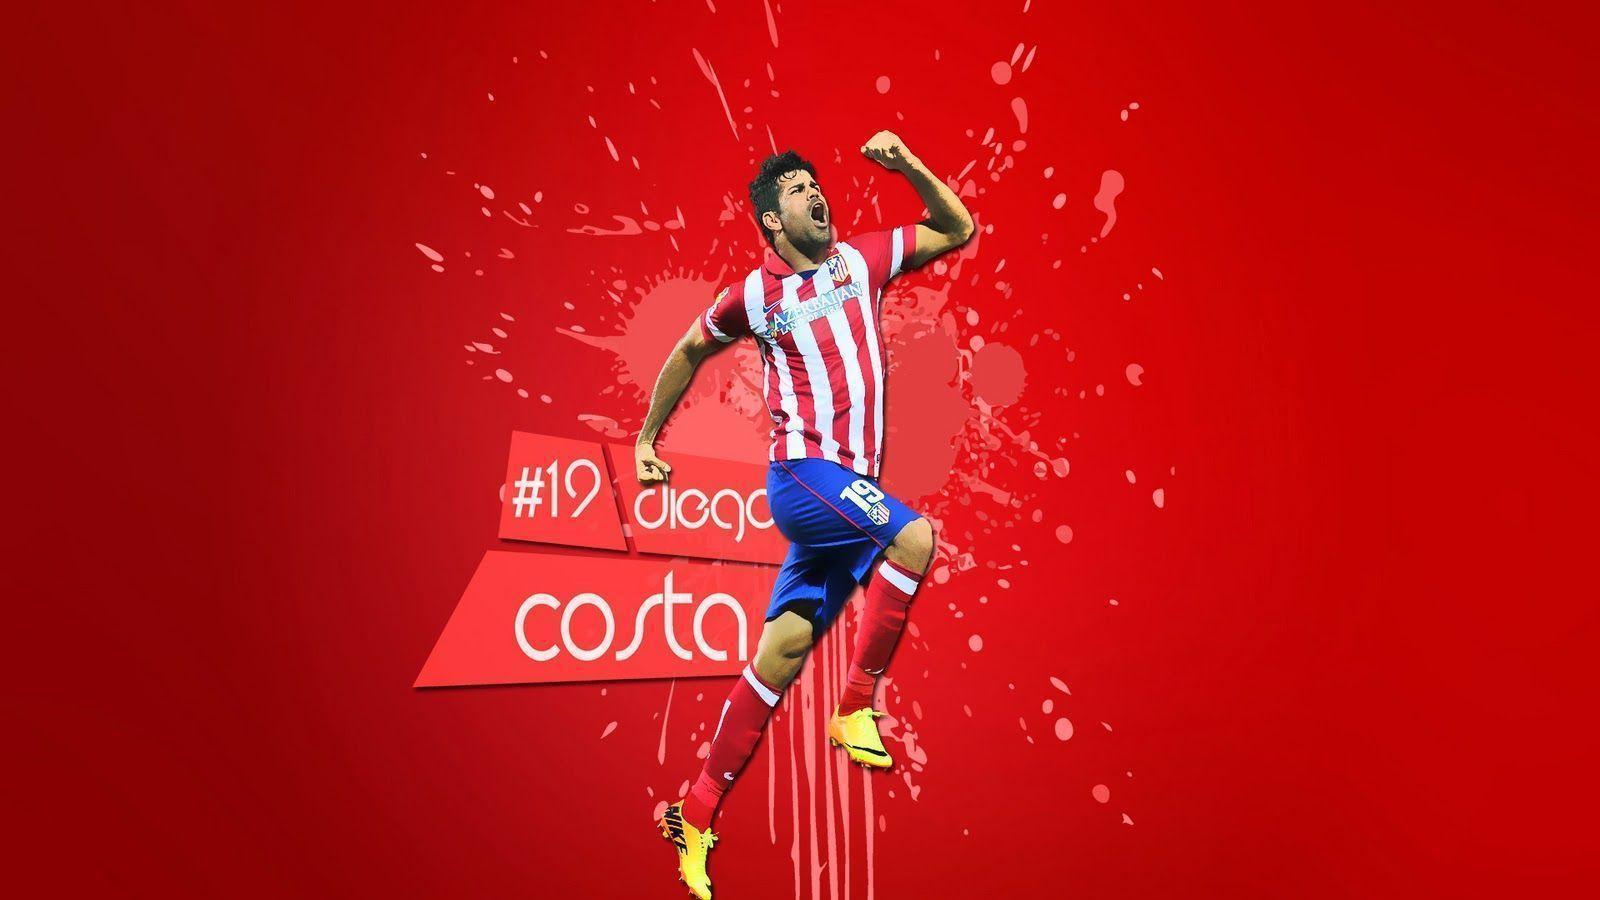 Diego Costa Atletico Madrid FC Wallpaper HQ 38 #1239 Wallpaper ...